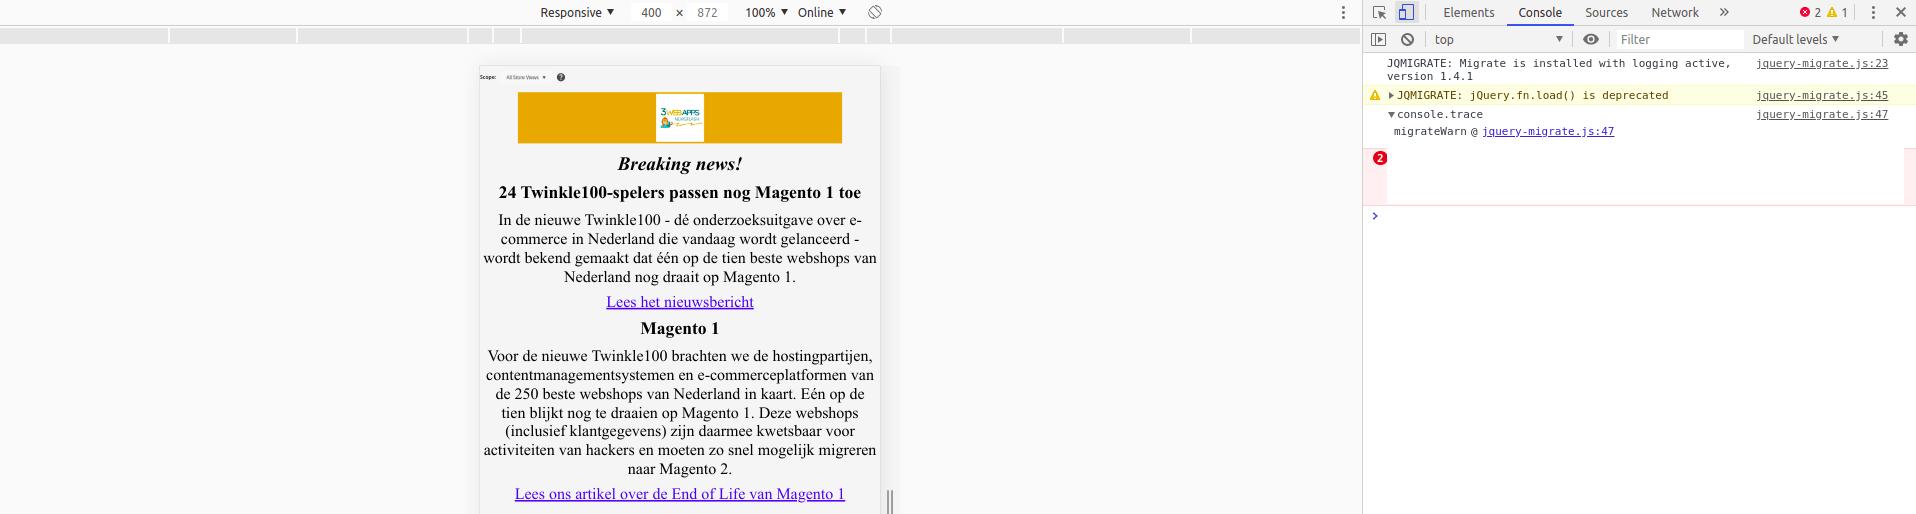 Magento 2 nieuwsbrief mobiele versie